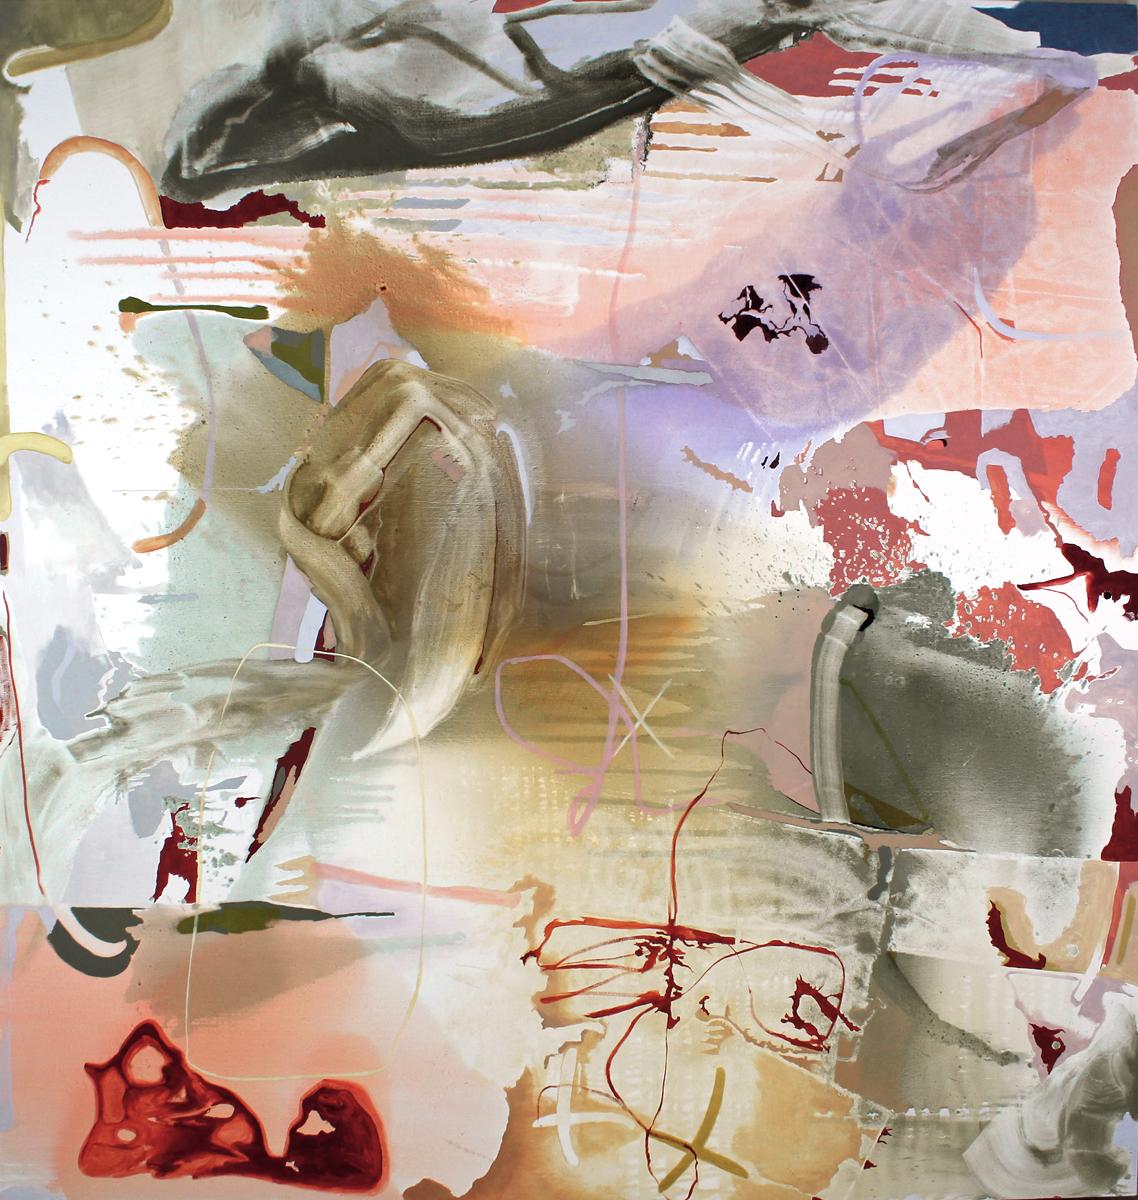 Speechfog. 80 x 84 in. oil on canvas. 2018.